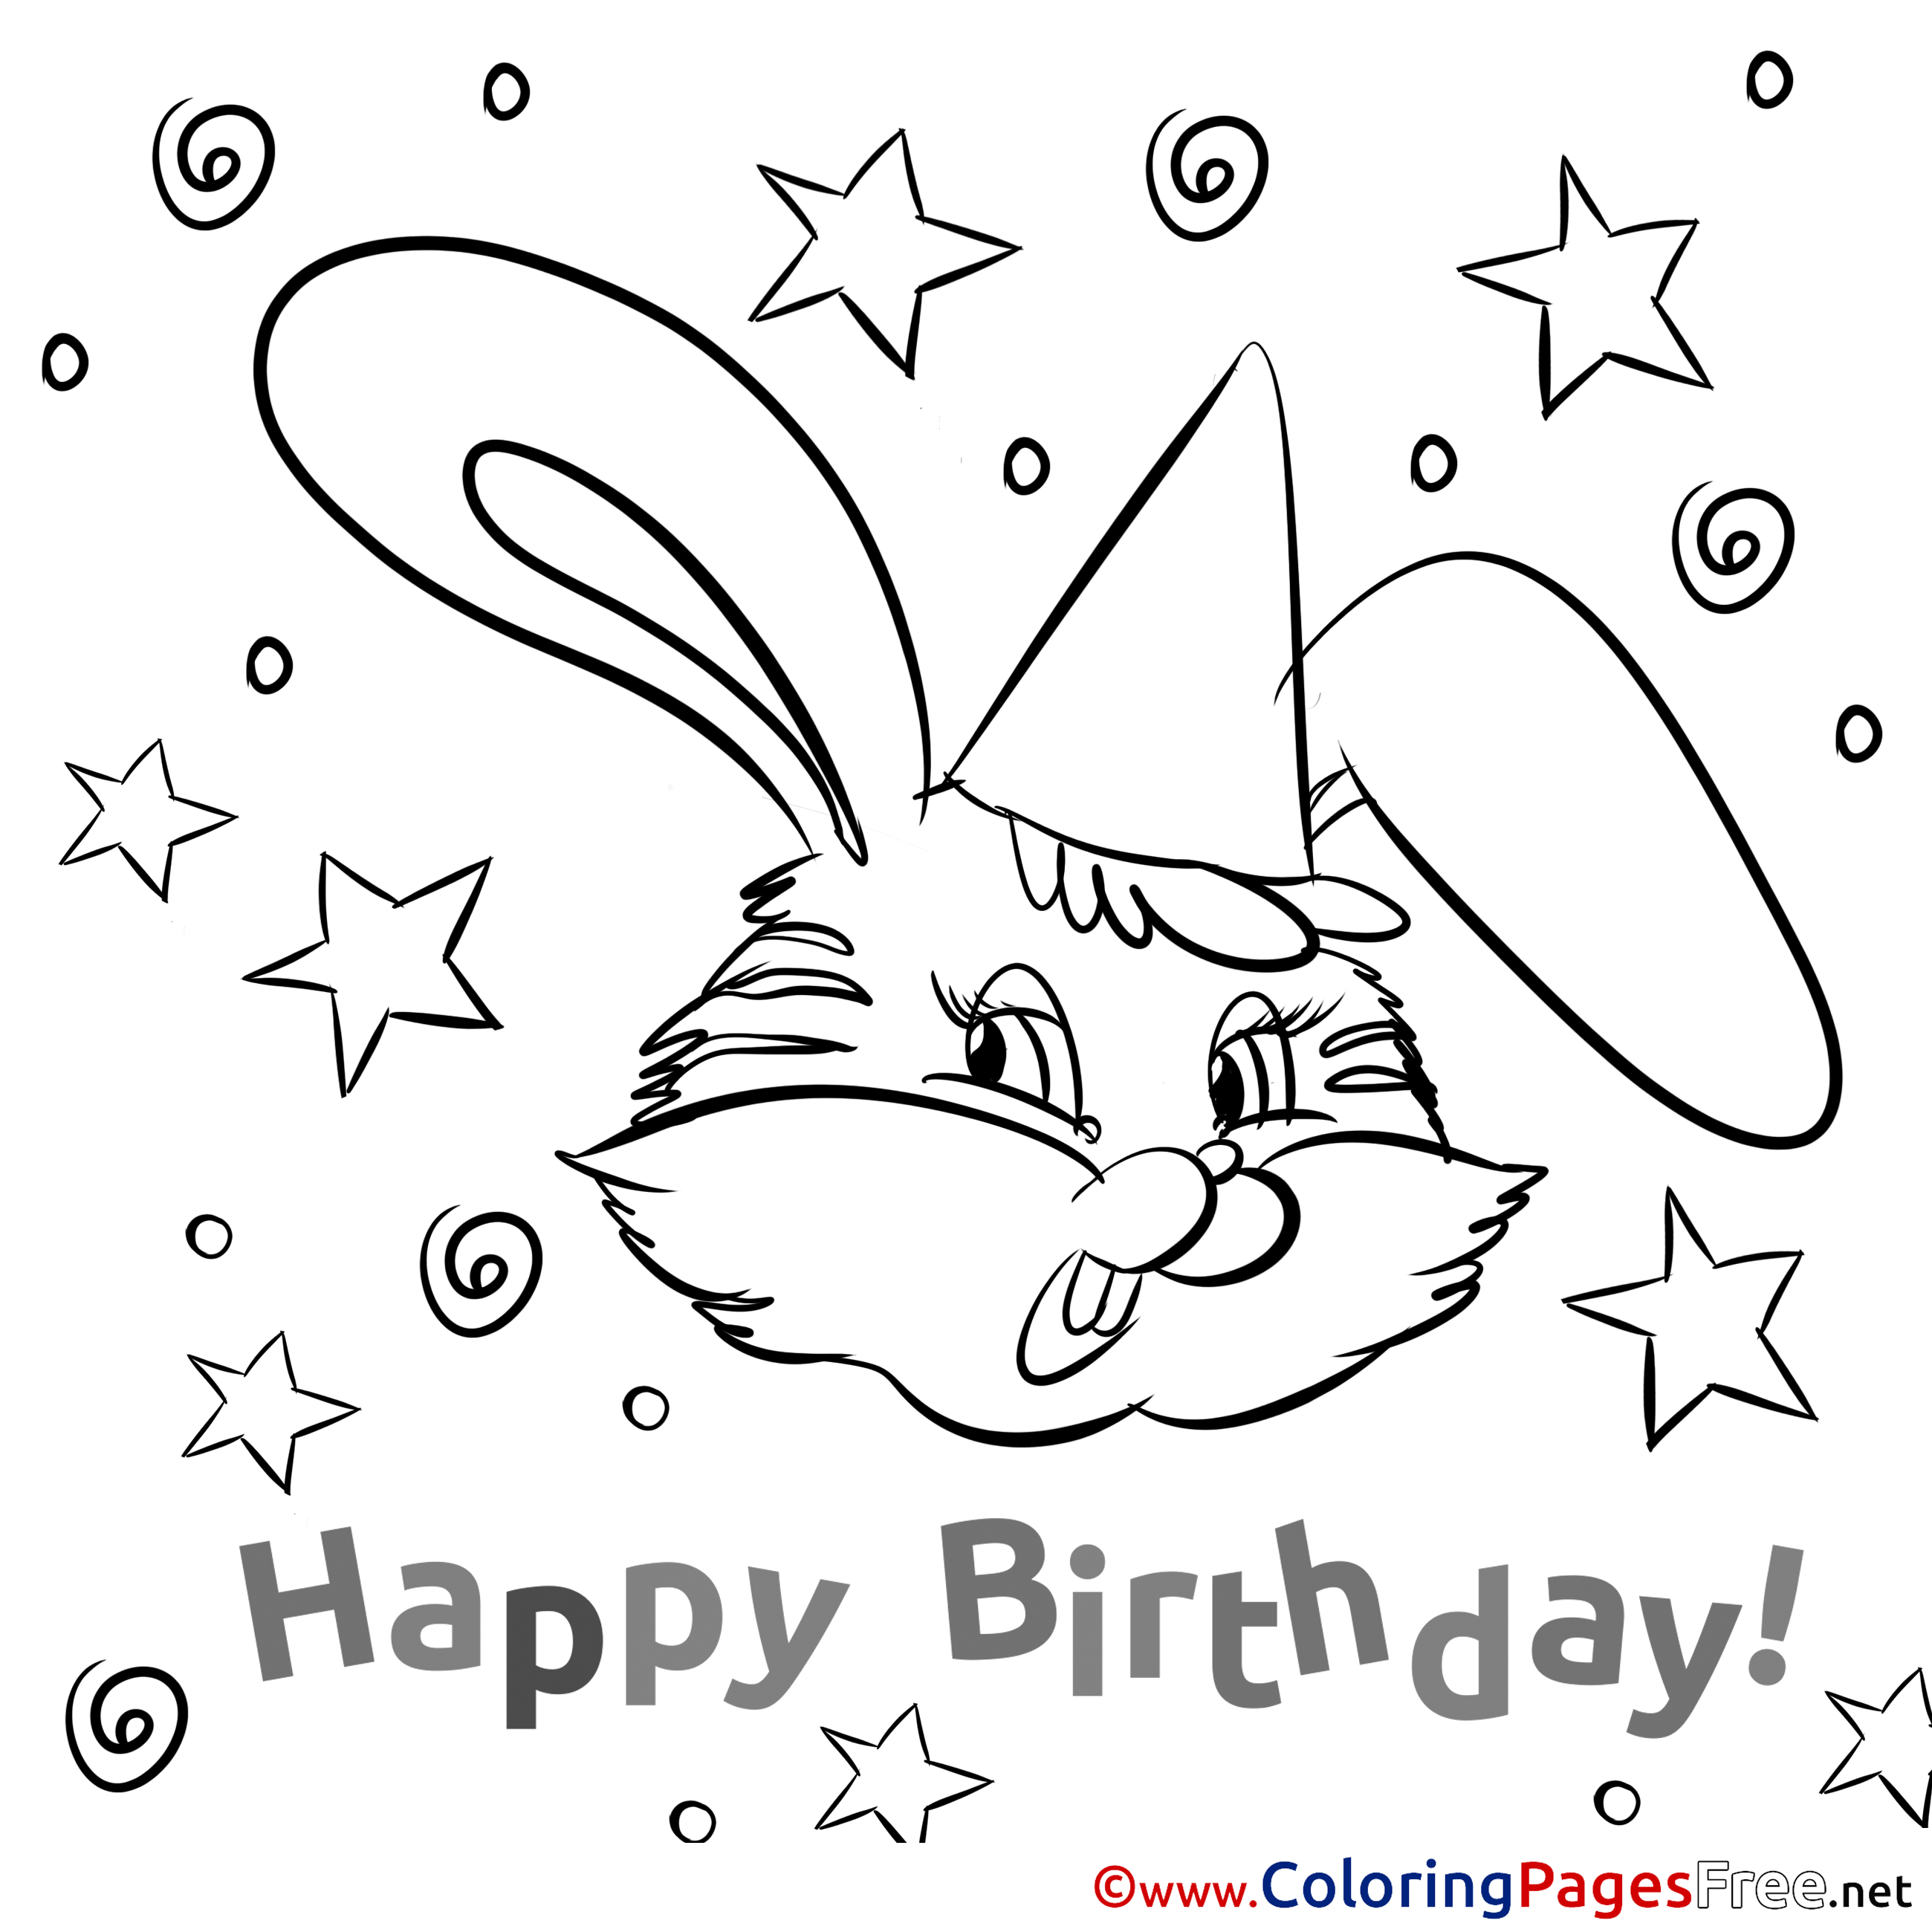 Bunny Colouring Page Happy Birthday free